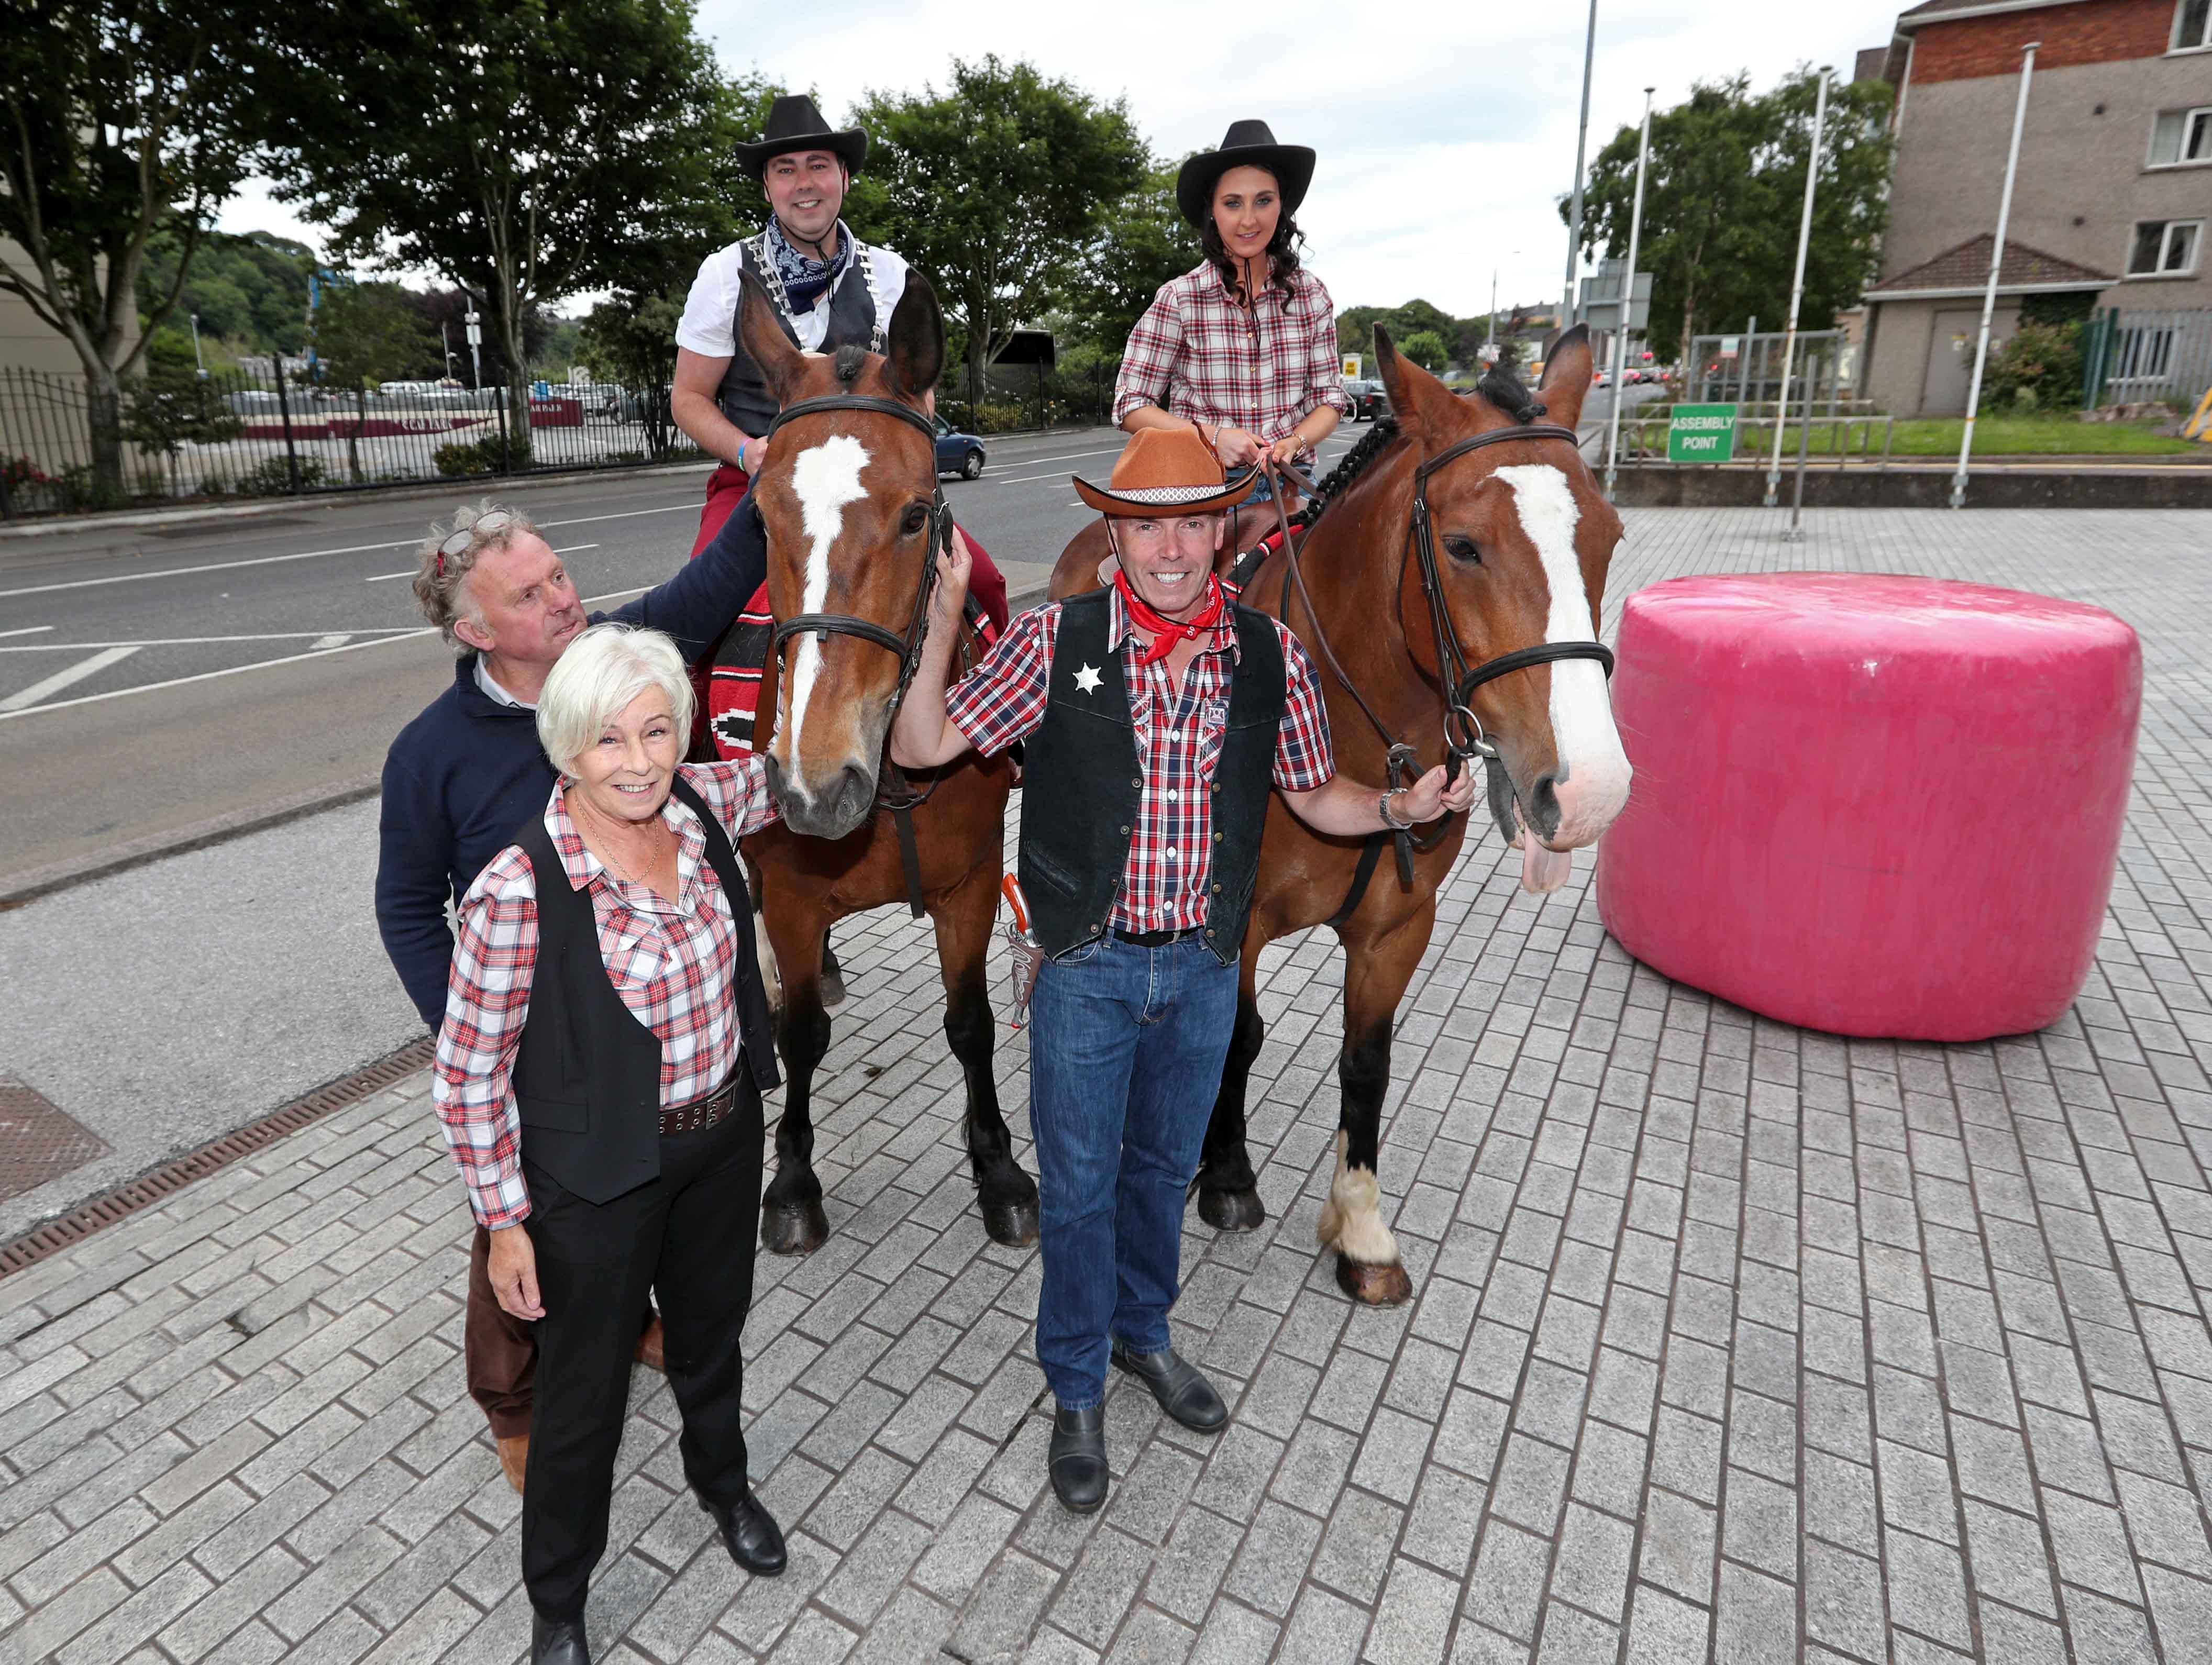 Cork County Mayor is a Cowboy?